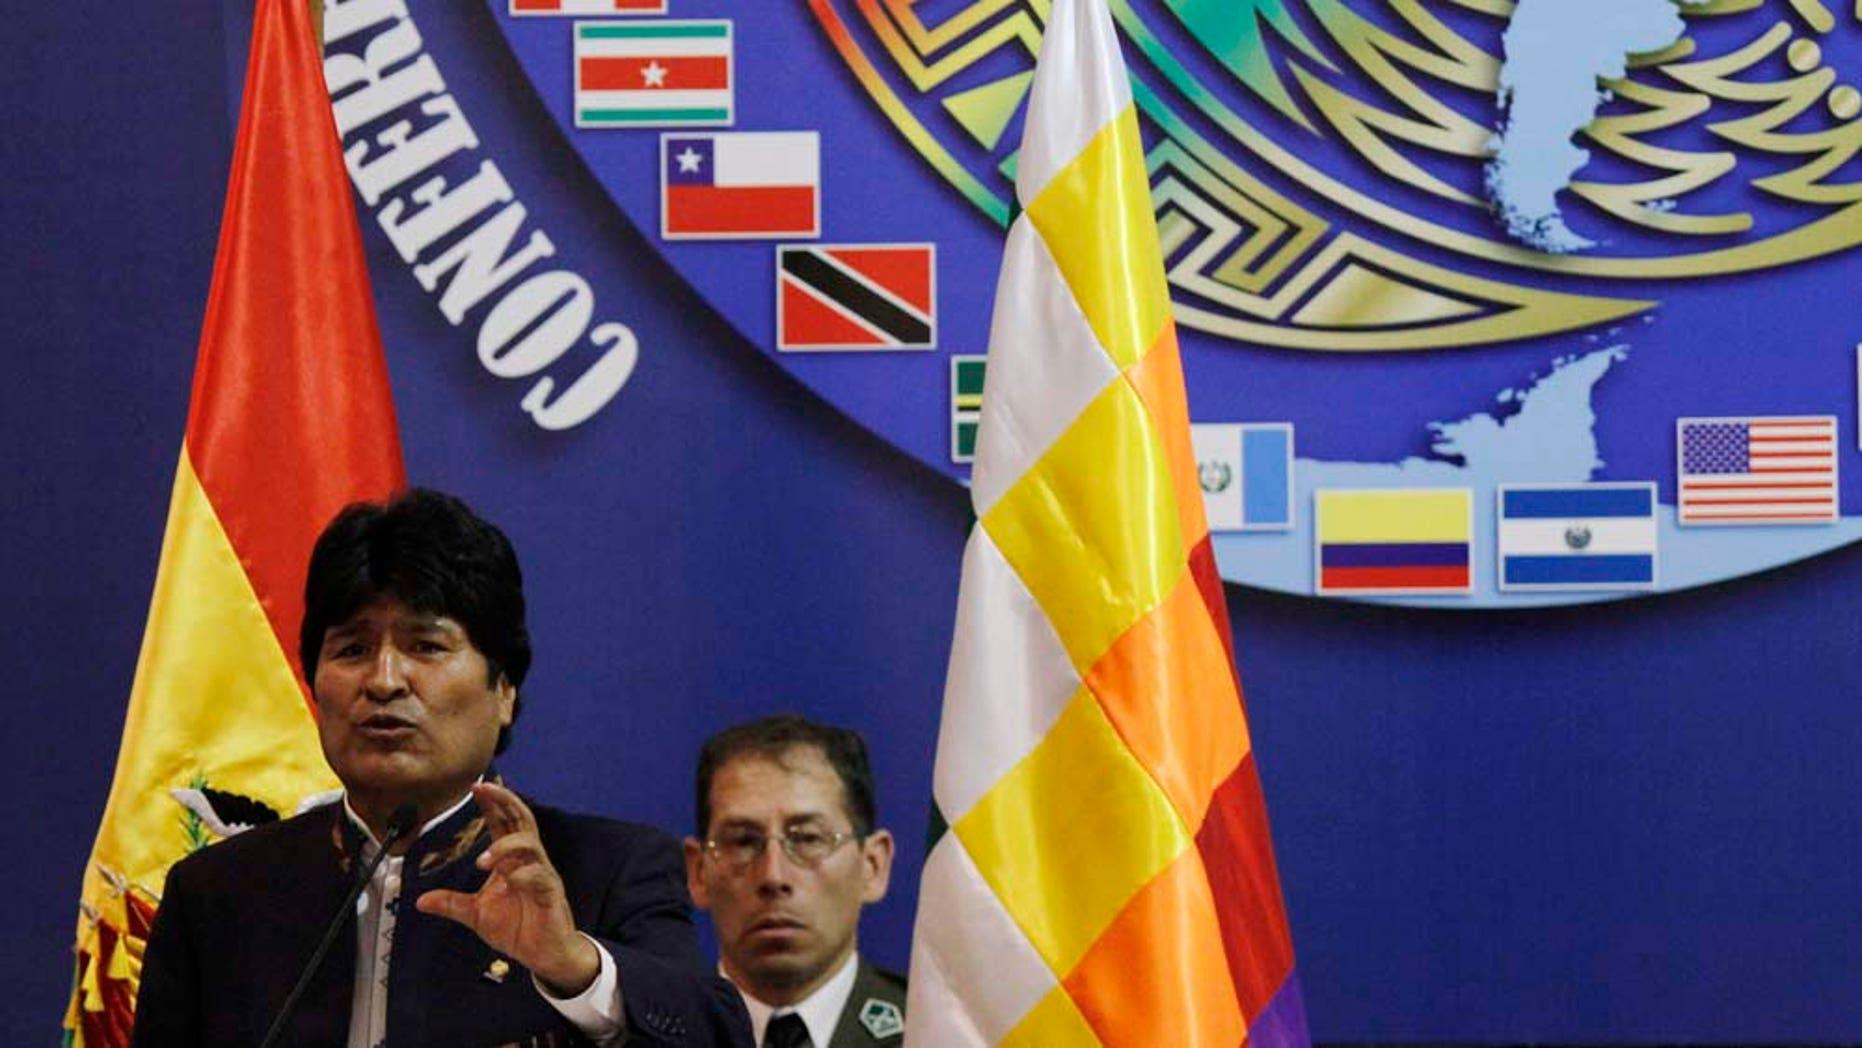 Bolivia's President Evo Morales speaks during the opening of the Ninth Conference of Defense Ministers of the Americas (CDMA) in Santa Cruz, Bolivia, Monday Nov. 22, 2010.  (AP Photo/Juan Karita)